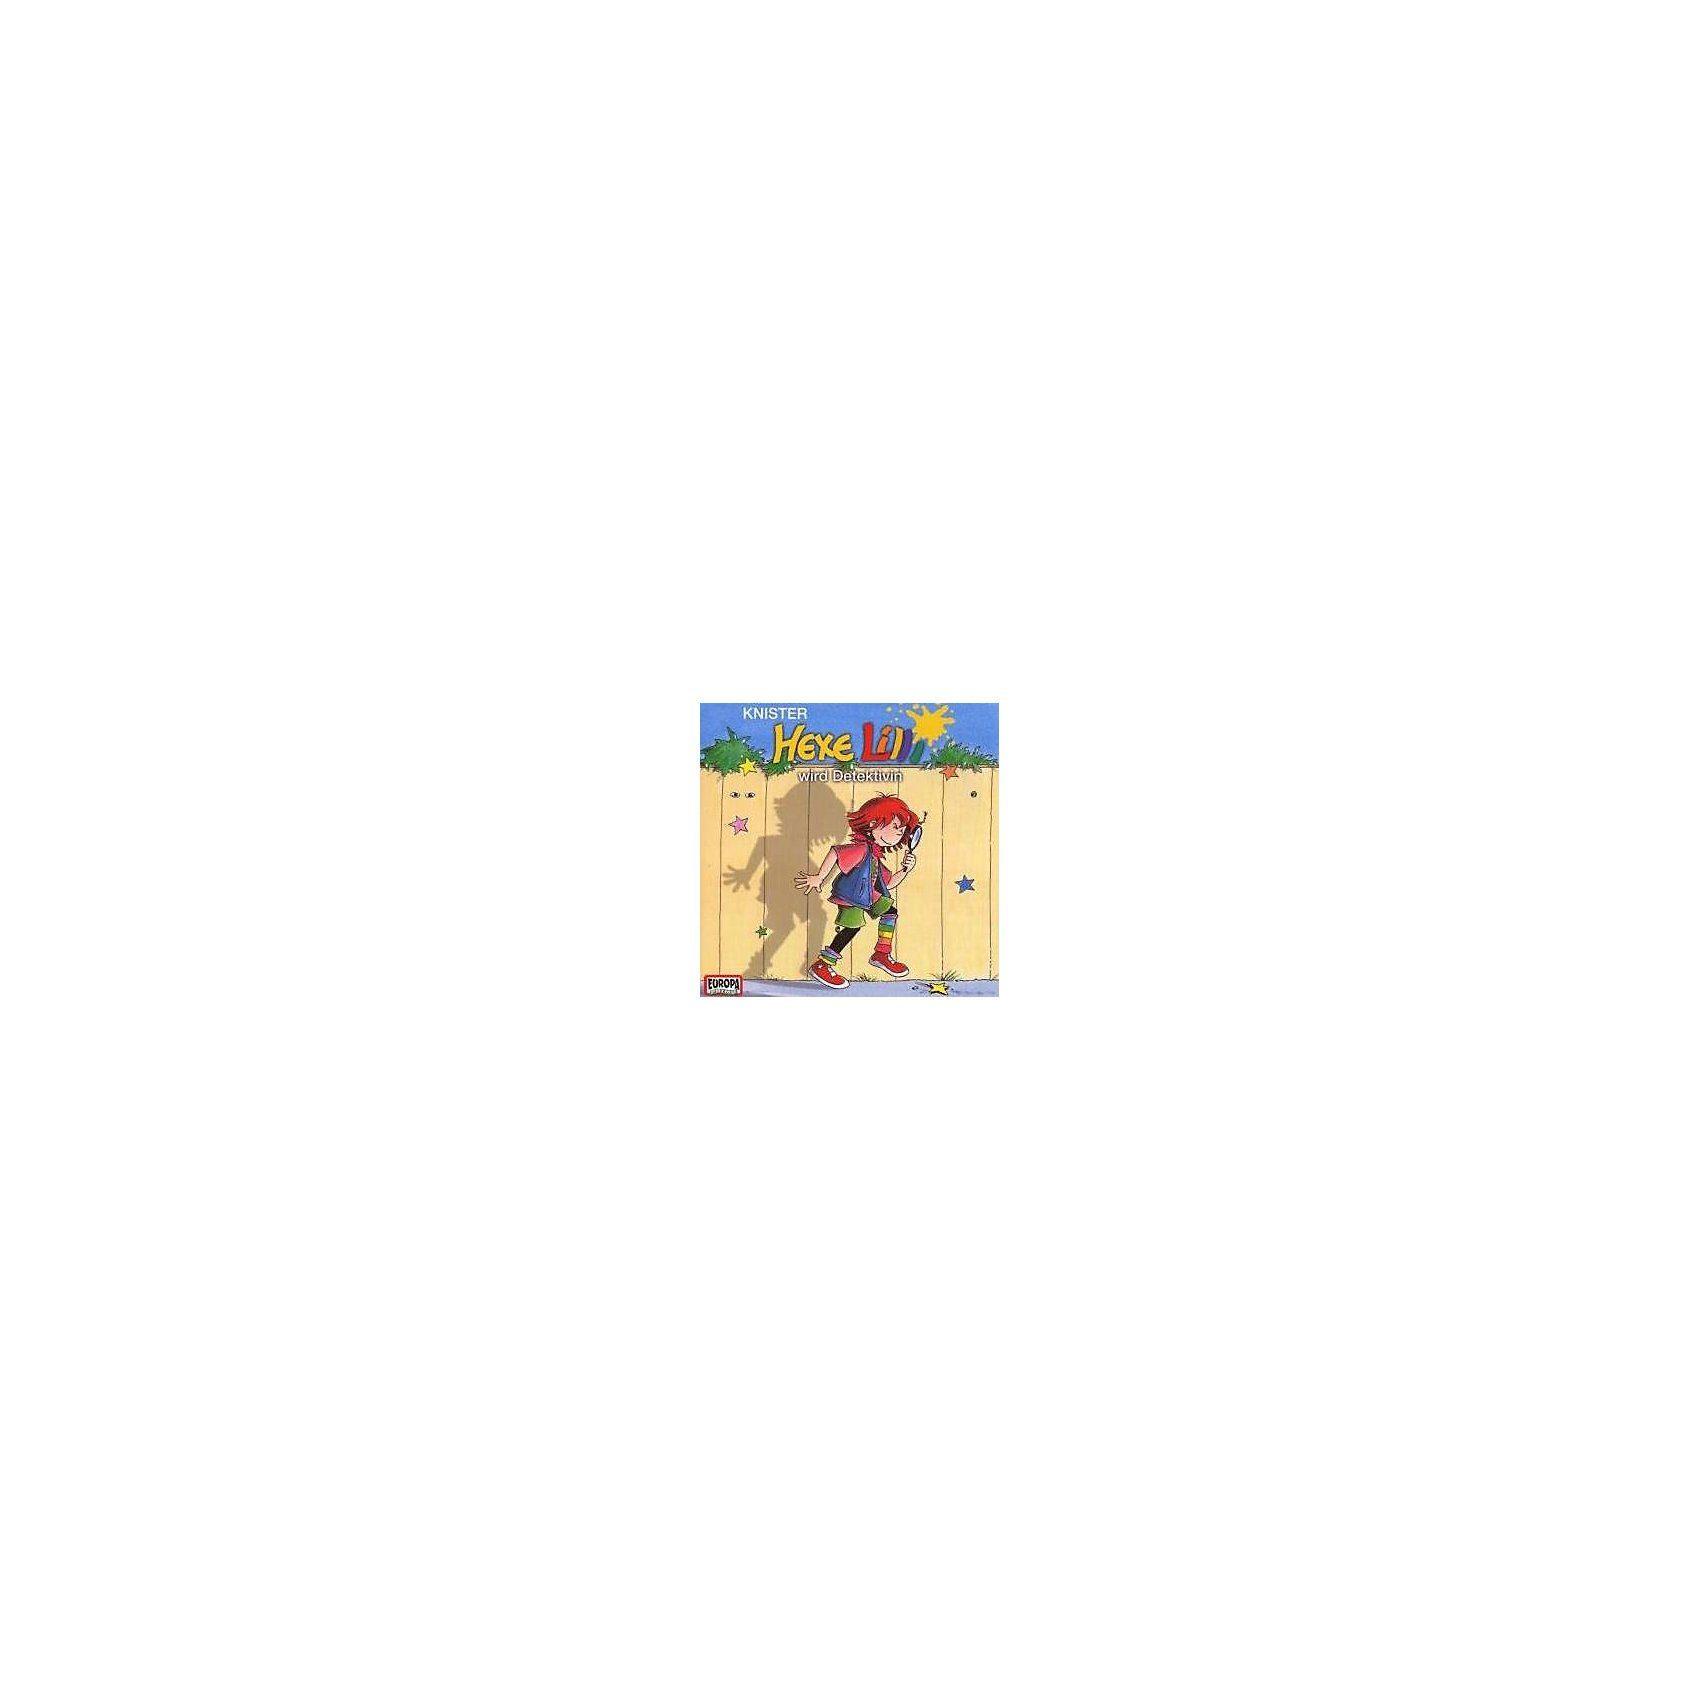 Sony CD Hexe Lilli: Wird Detektivin